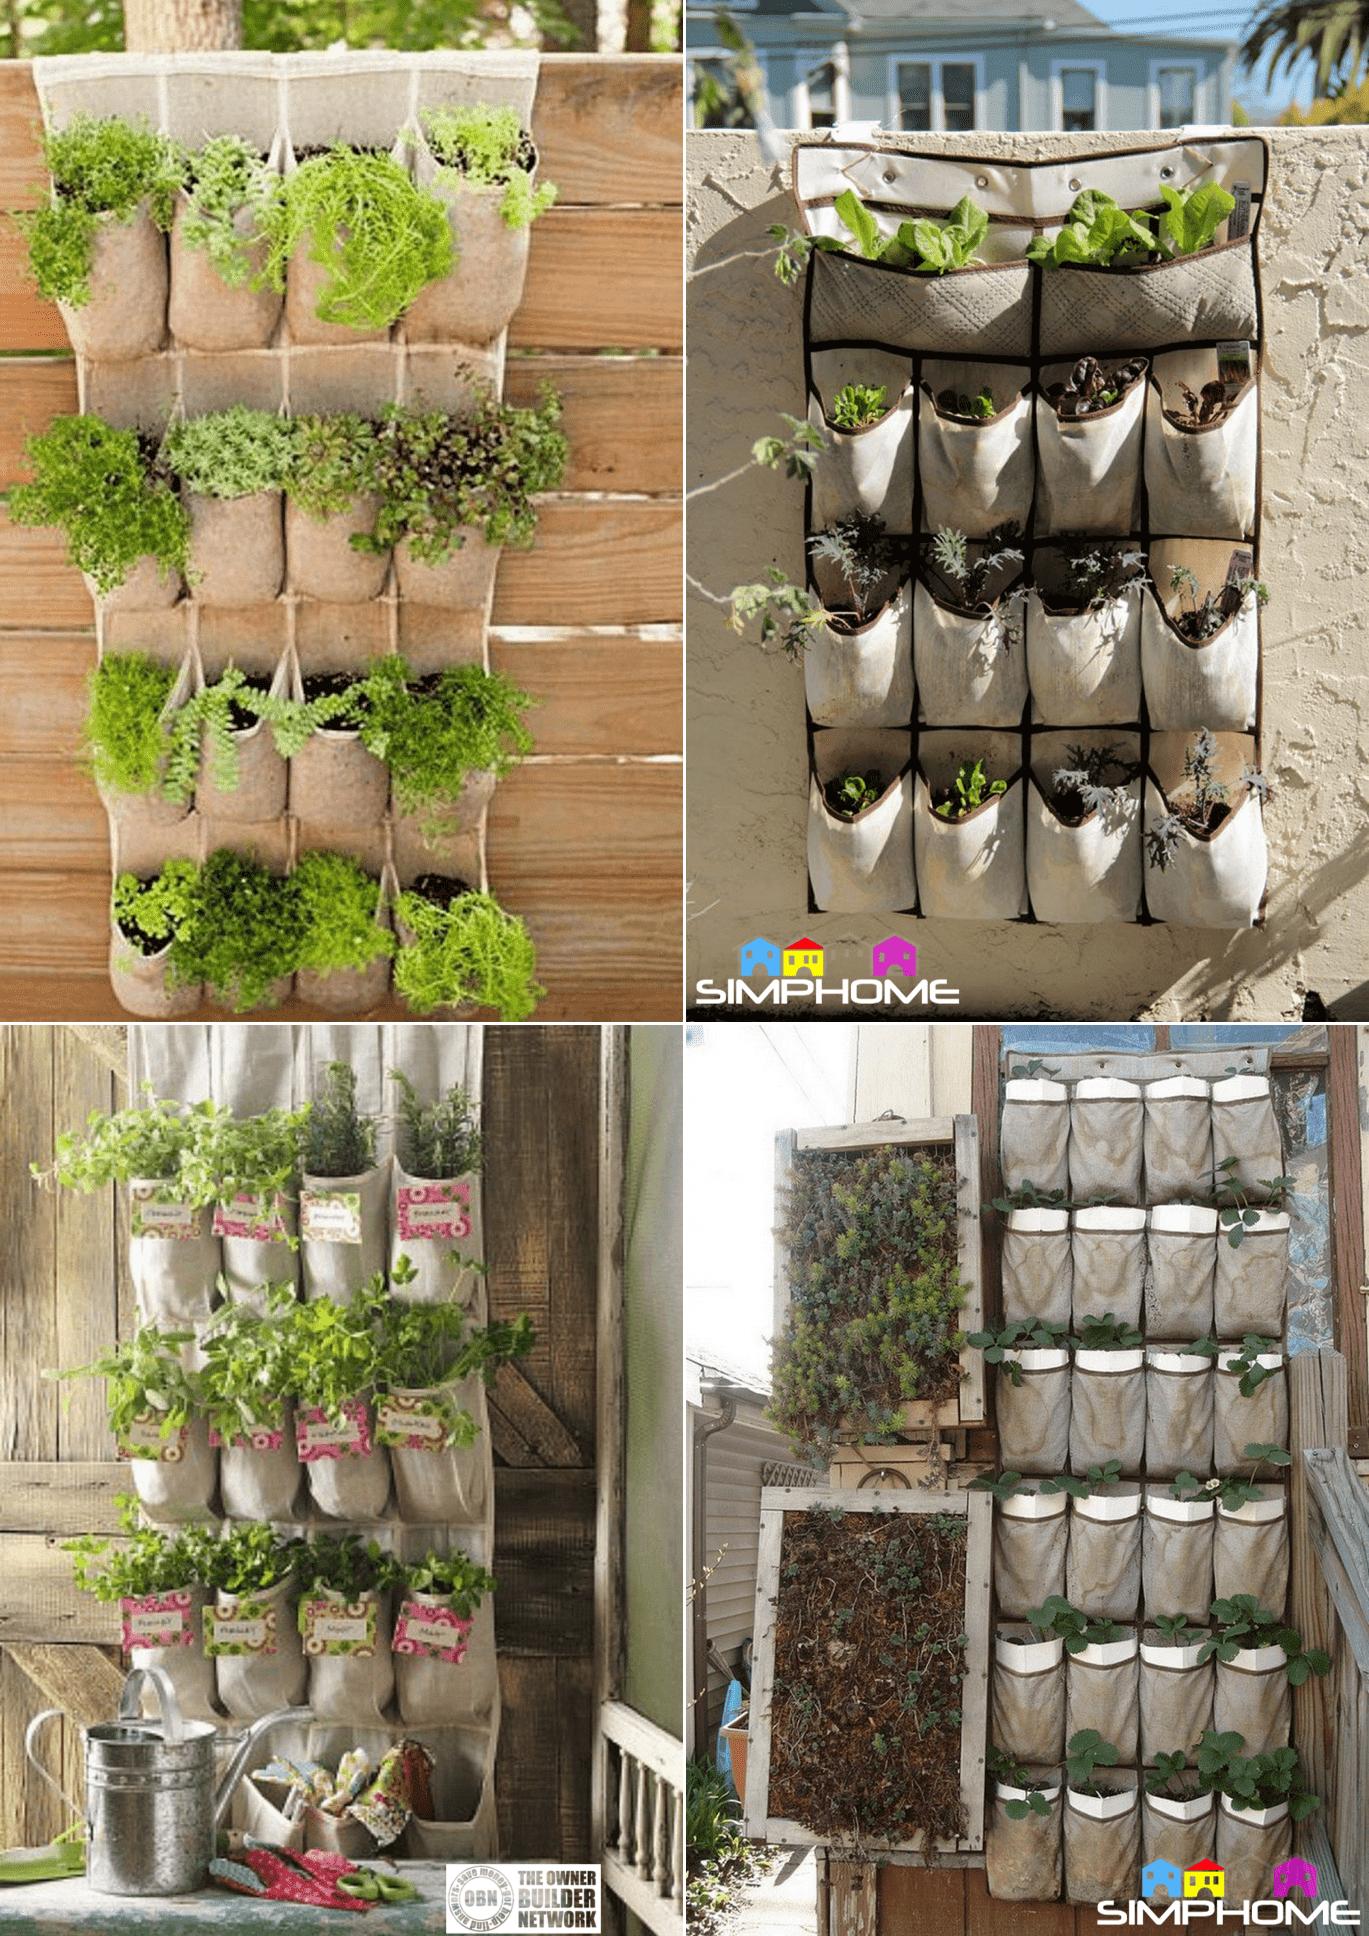 6.Shoe Organizer Vegetable Garden Projects via simphome.com